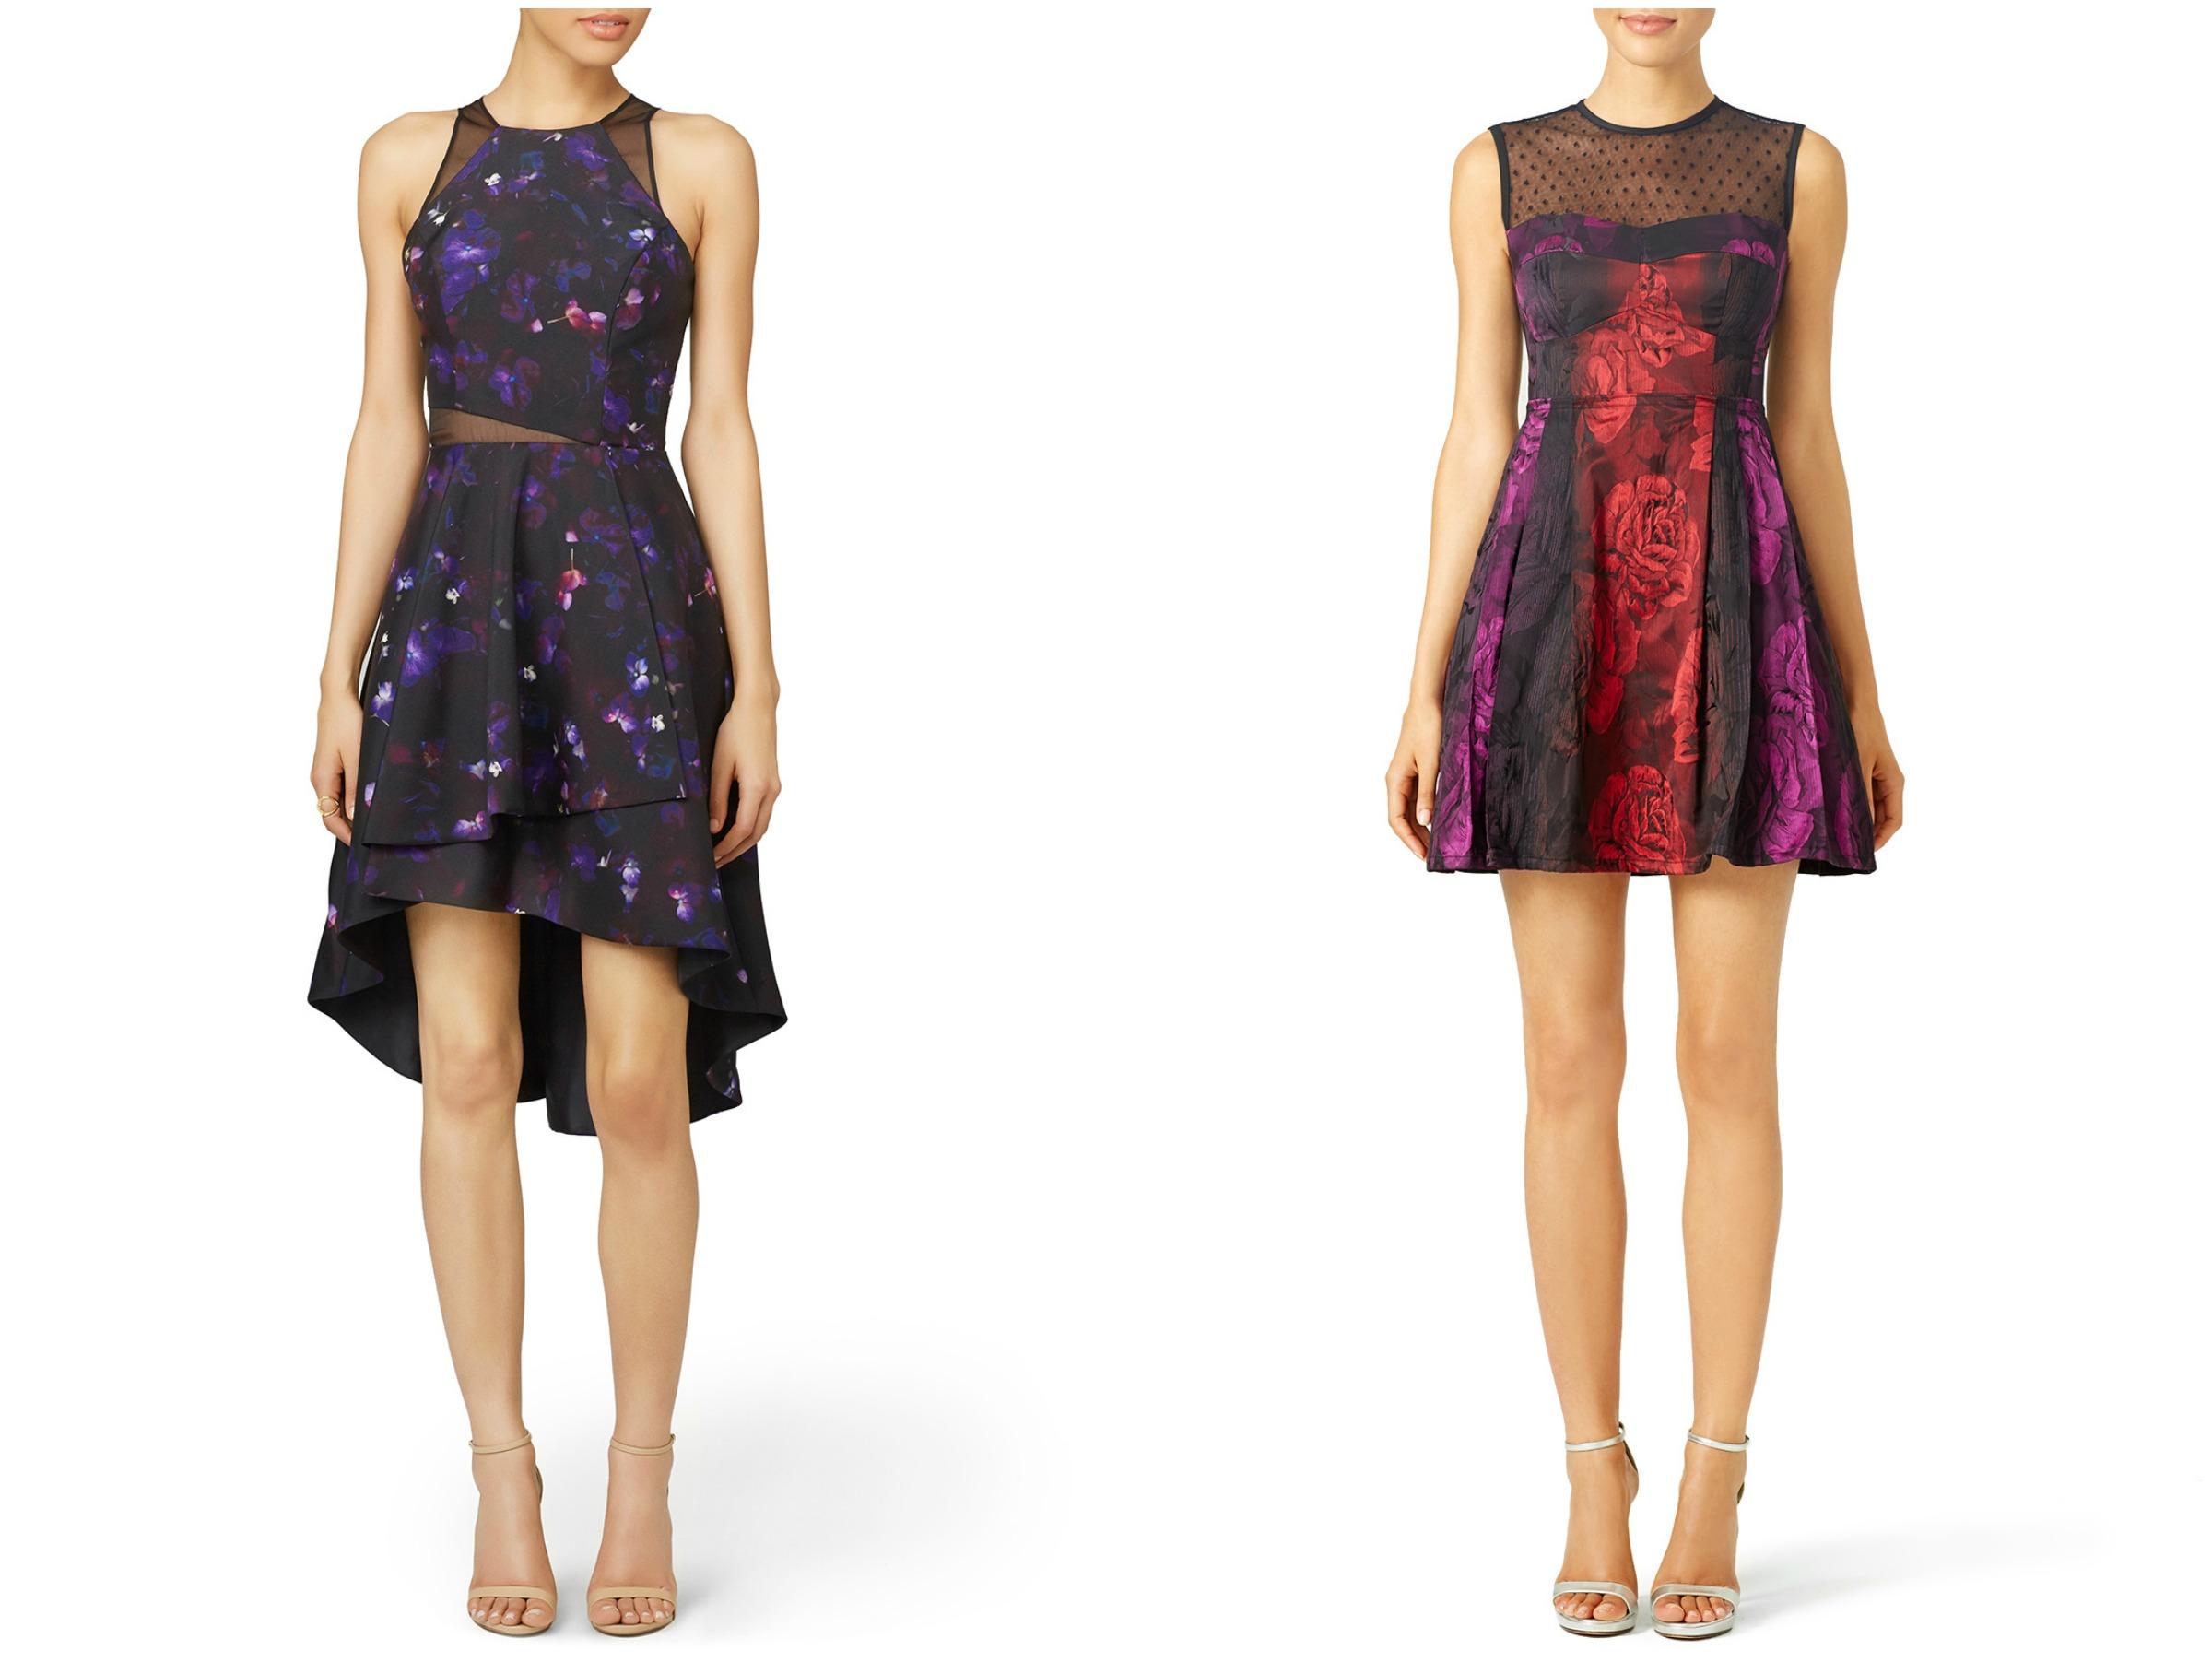 Floral Dress Collage 1